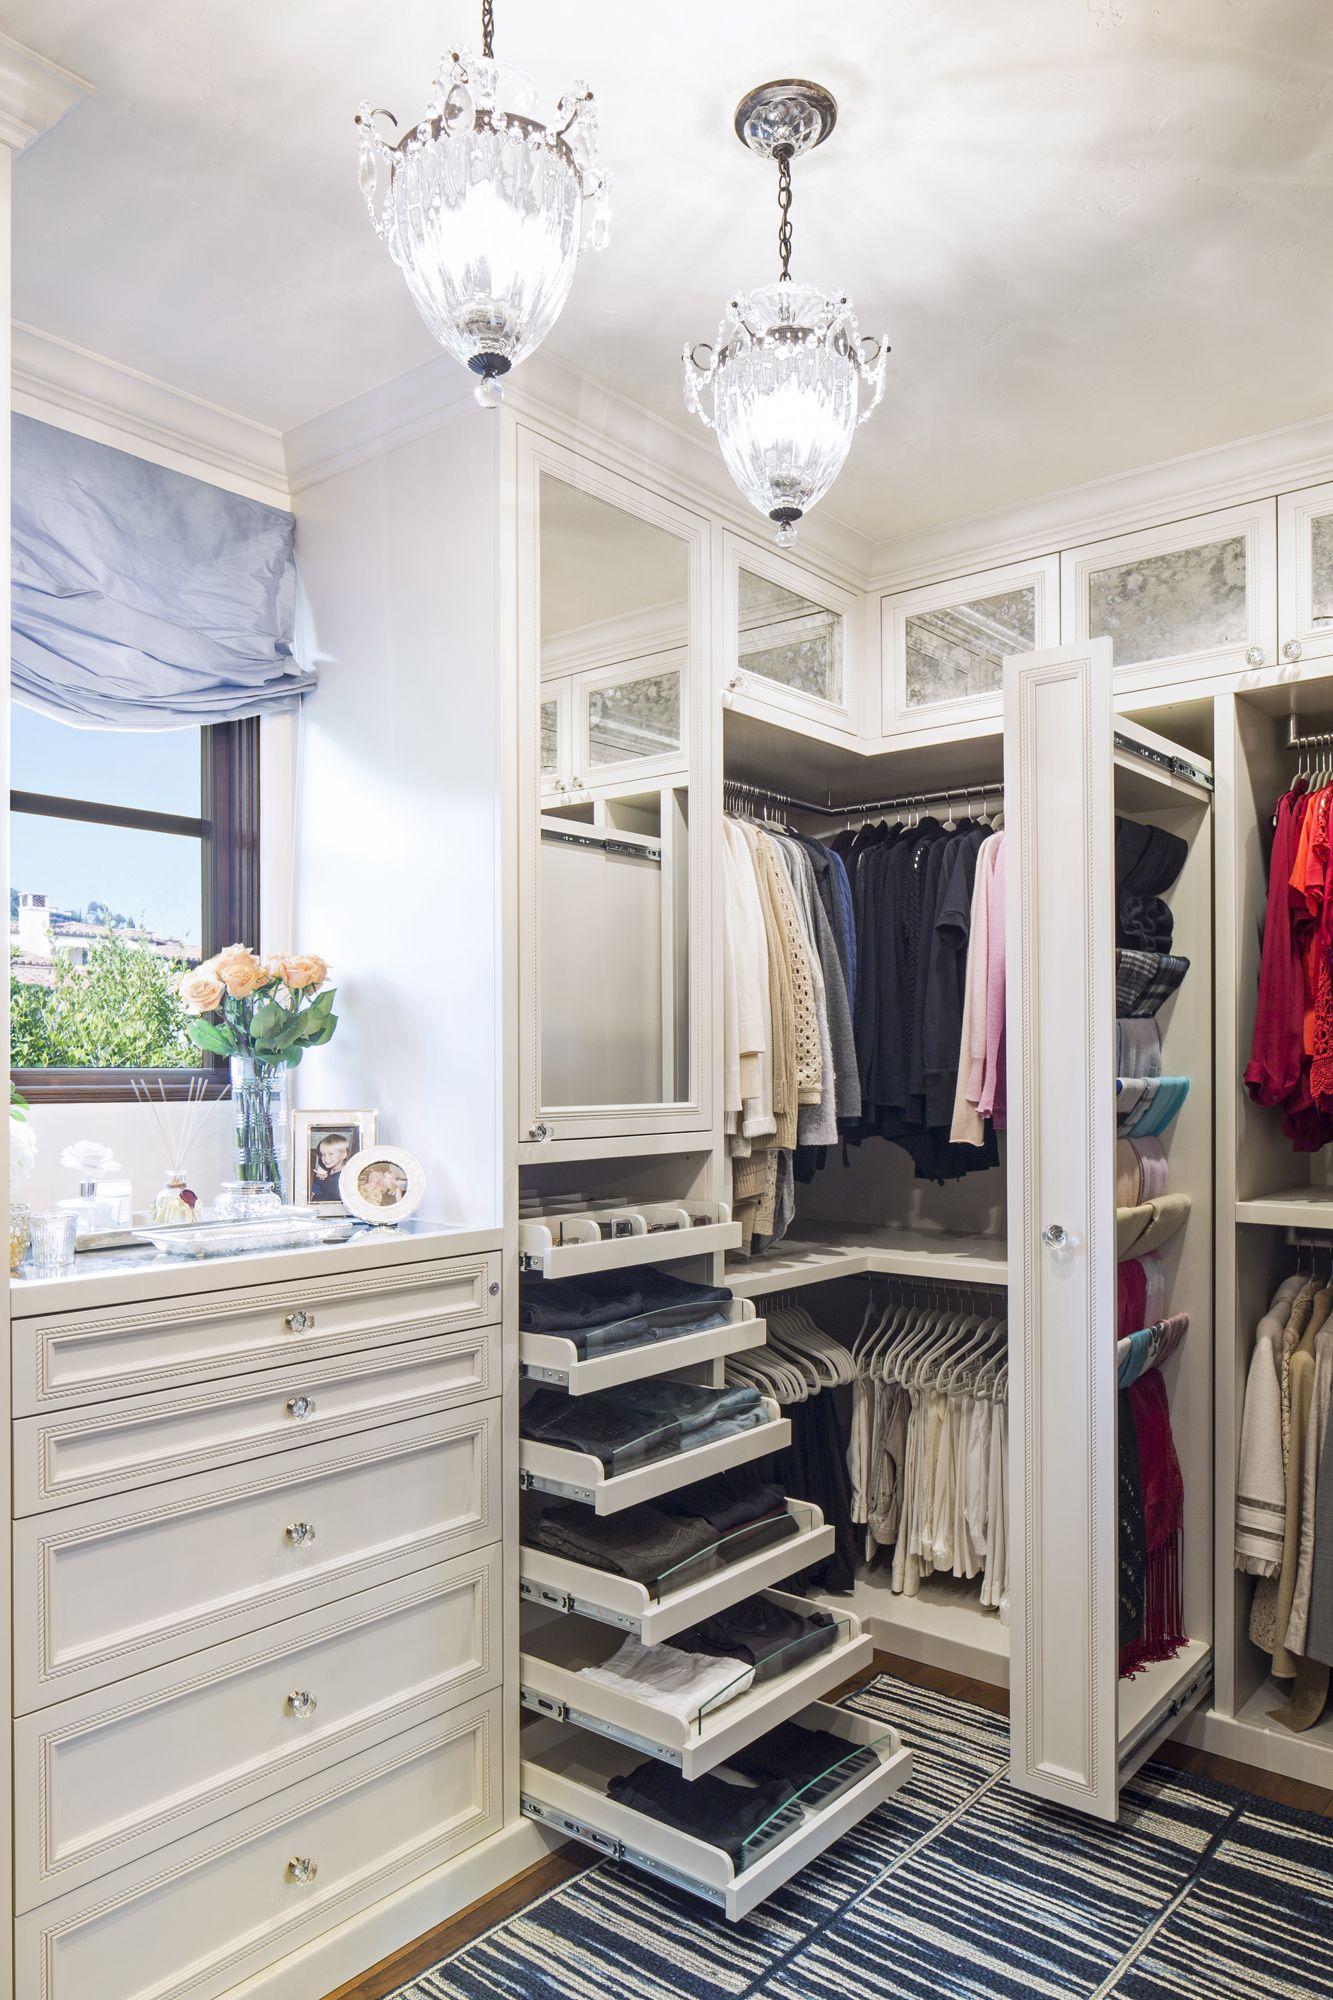 8 Simple Closet Ideas From Lisa Adams  Closet